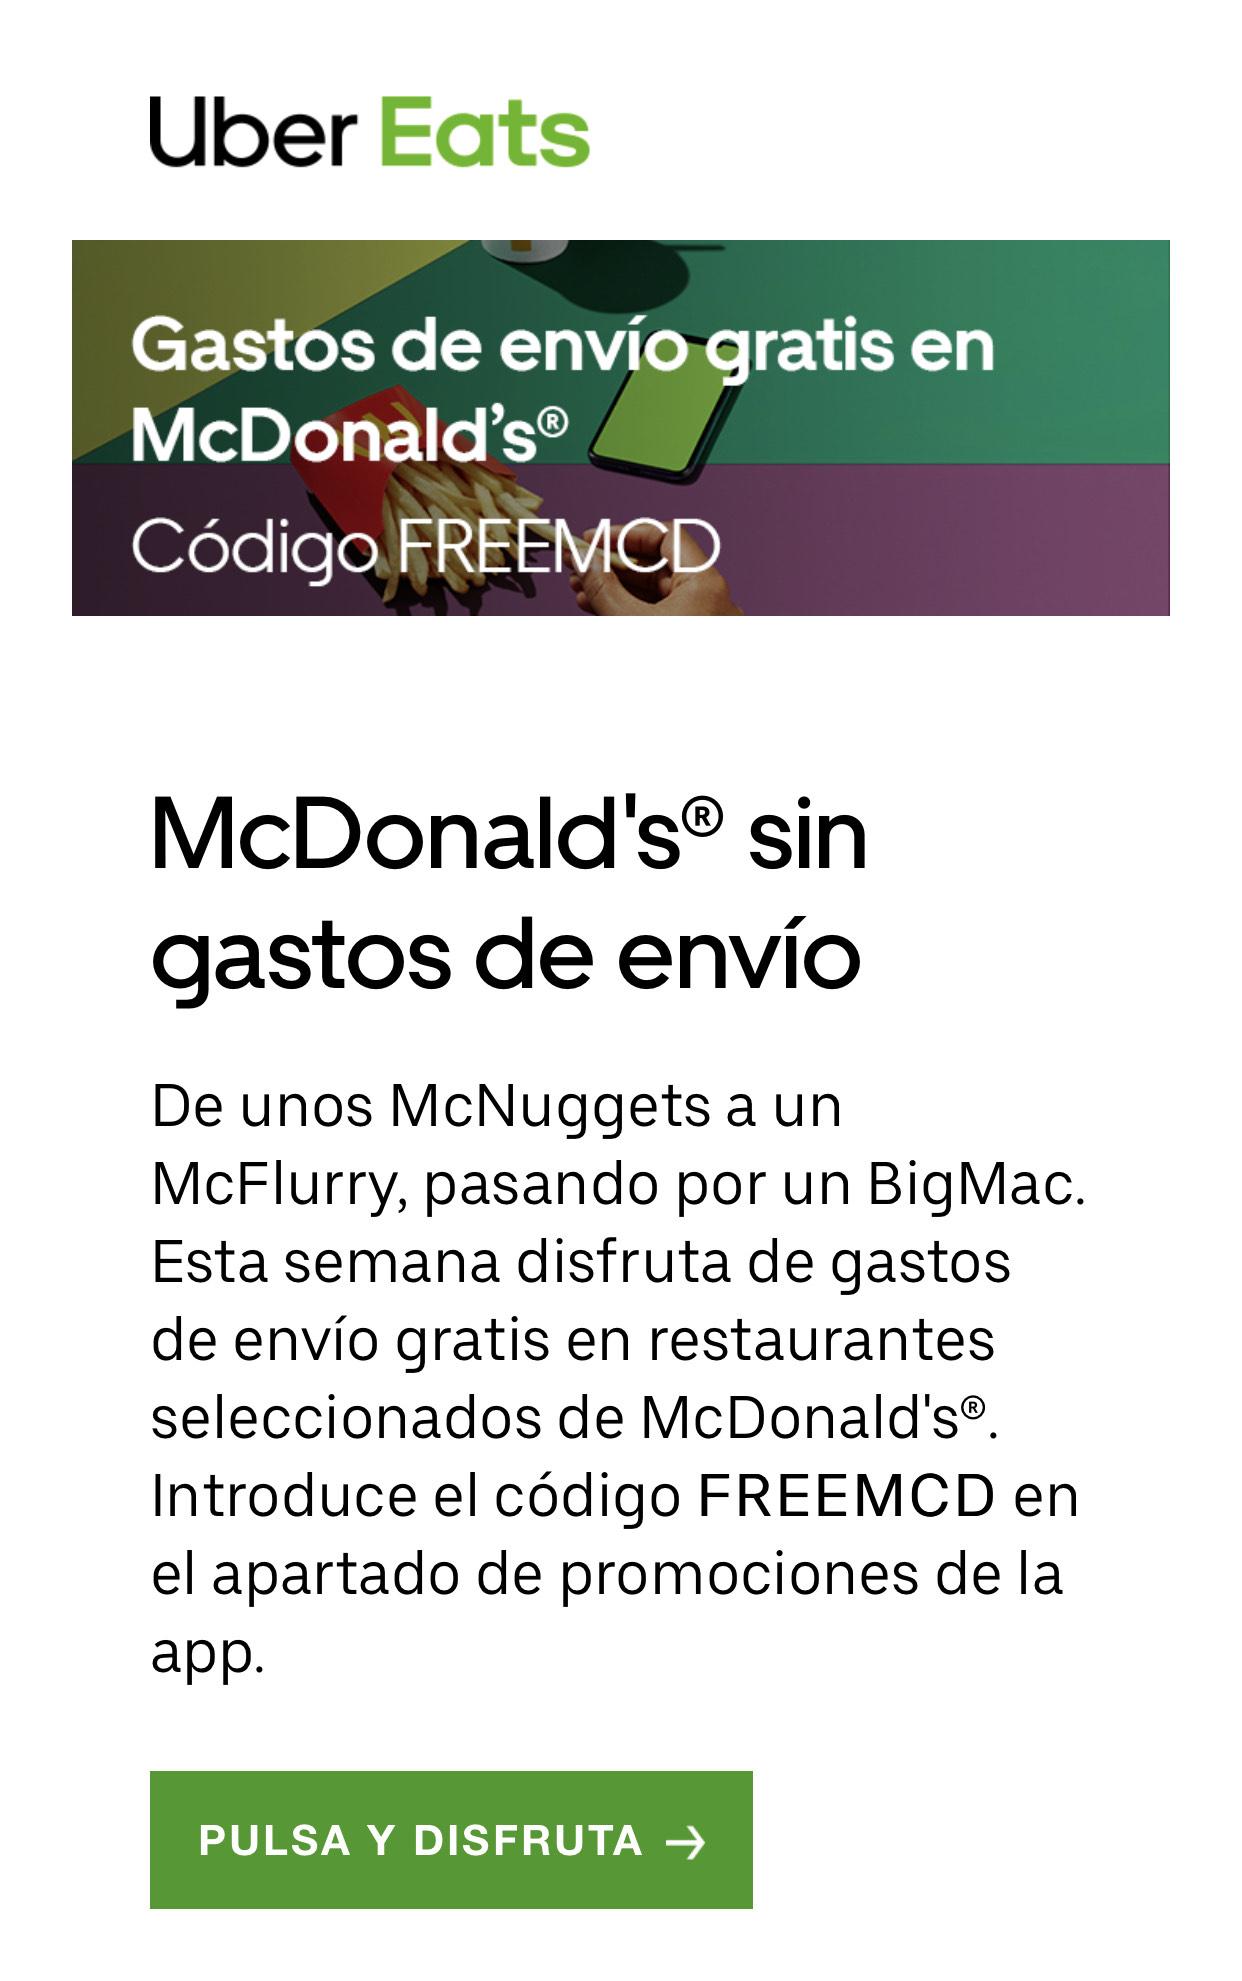 Envío gratis McDonalds Uber eats